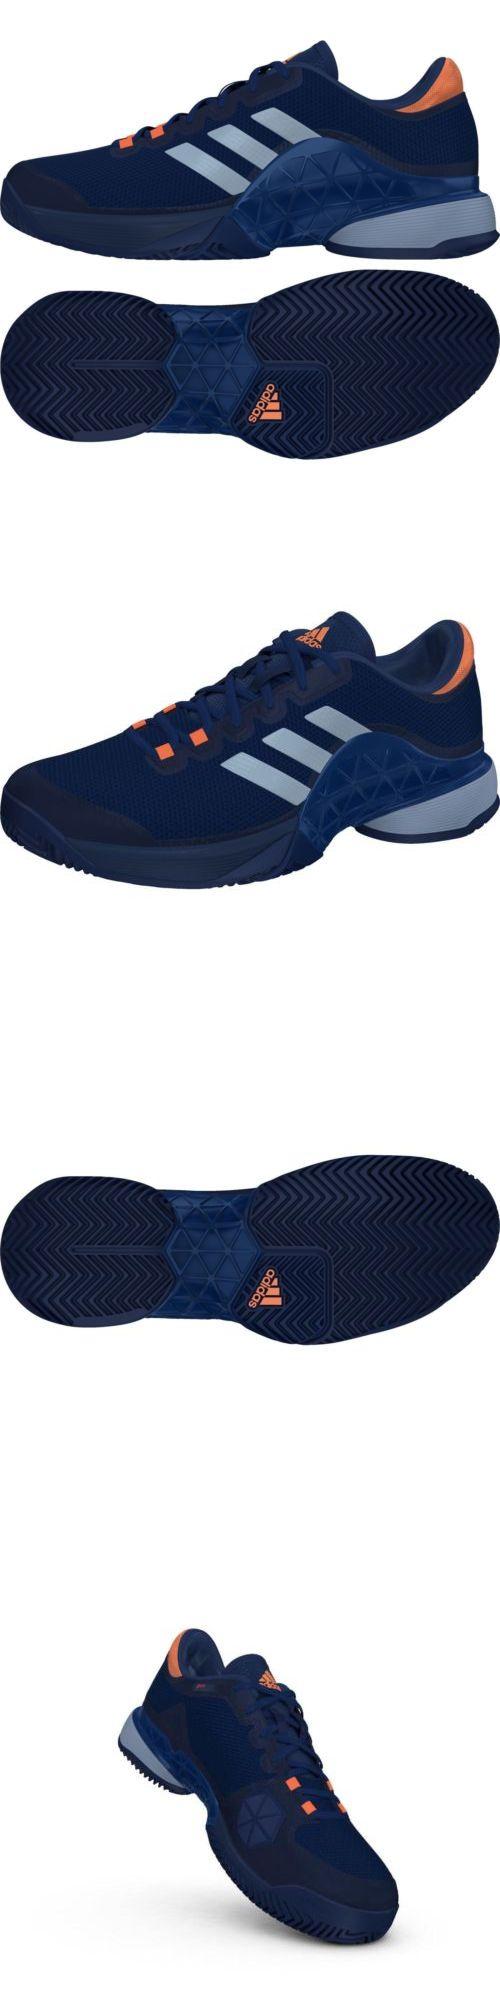 Shoes 62230: Adidas Barricade 2017 Men Blue Orange Ba9073 + Free Socks -> BUY IT NOW ONLY: $79.95 on eBay!